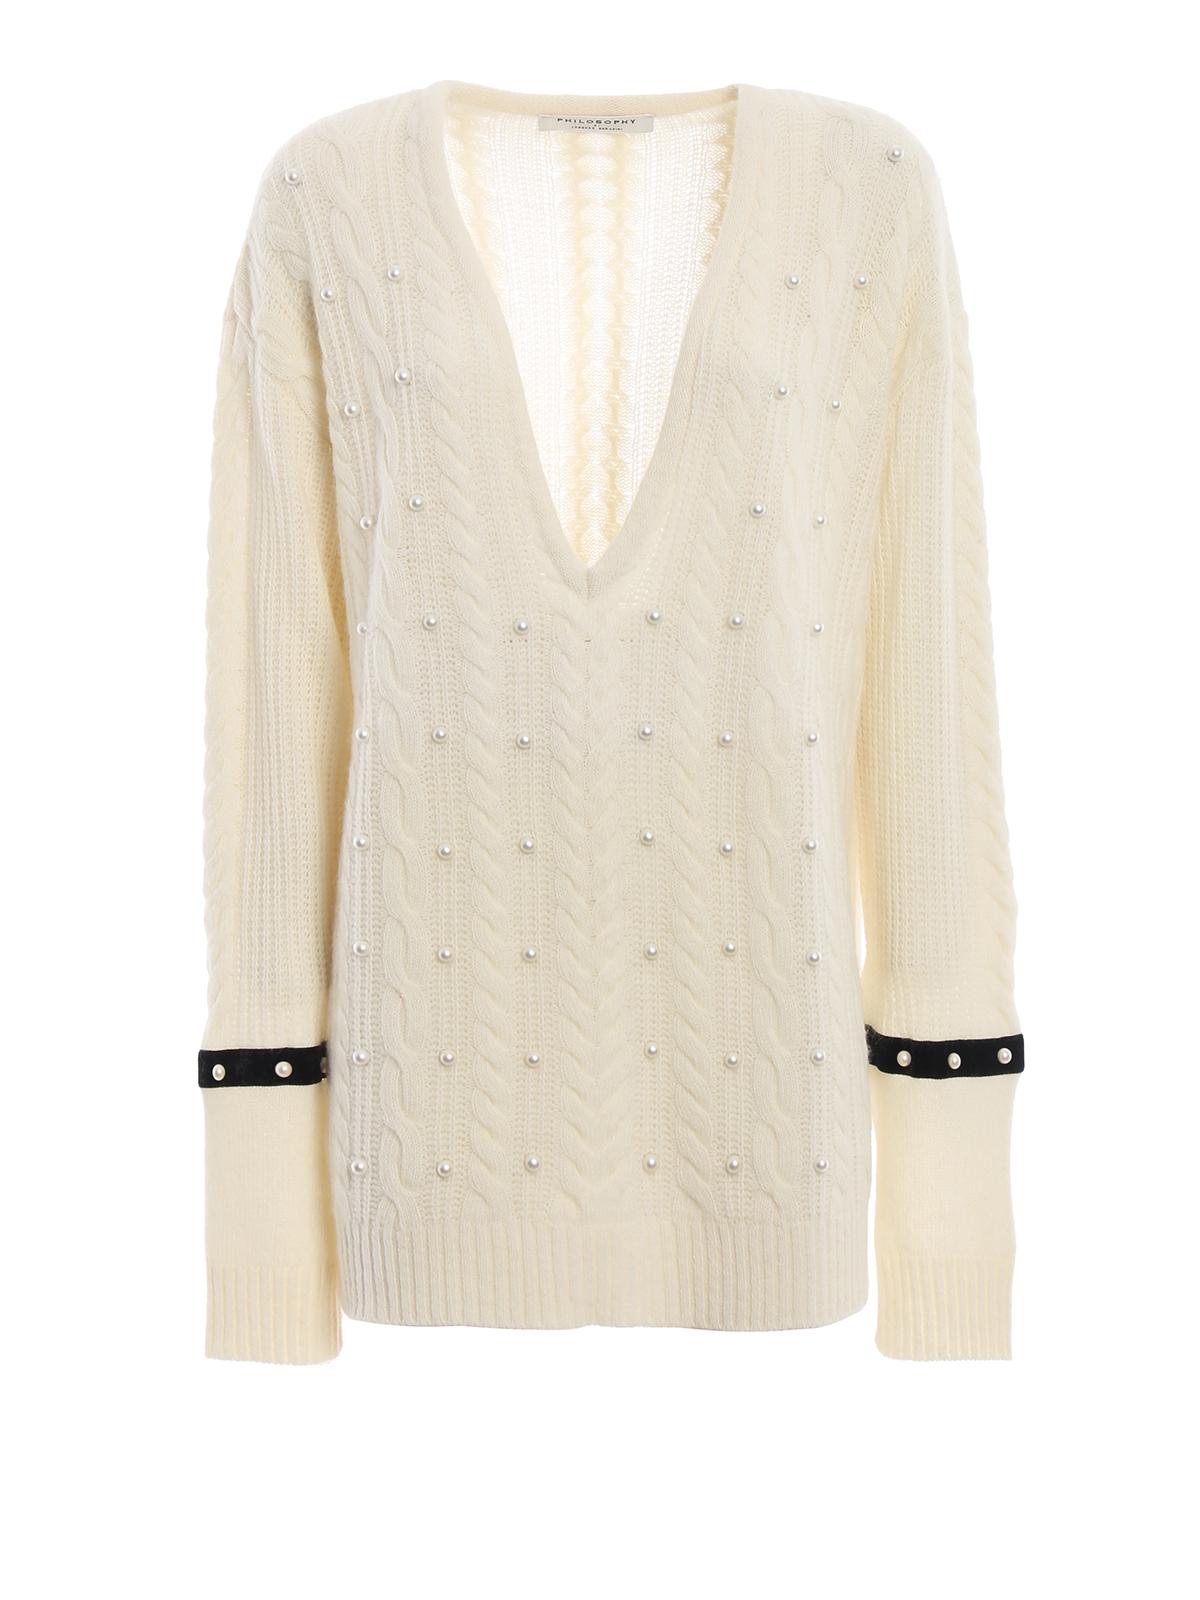 c9a2c914988f19 Philosophy di Lorenzo Serafini: v necks - Pearl embellished oversize cable knit  sweater